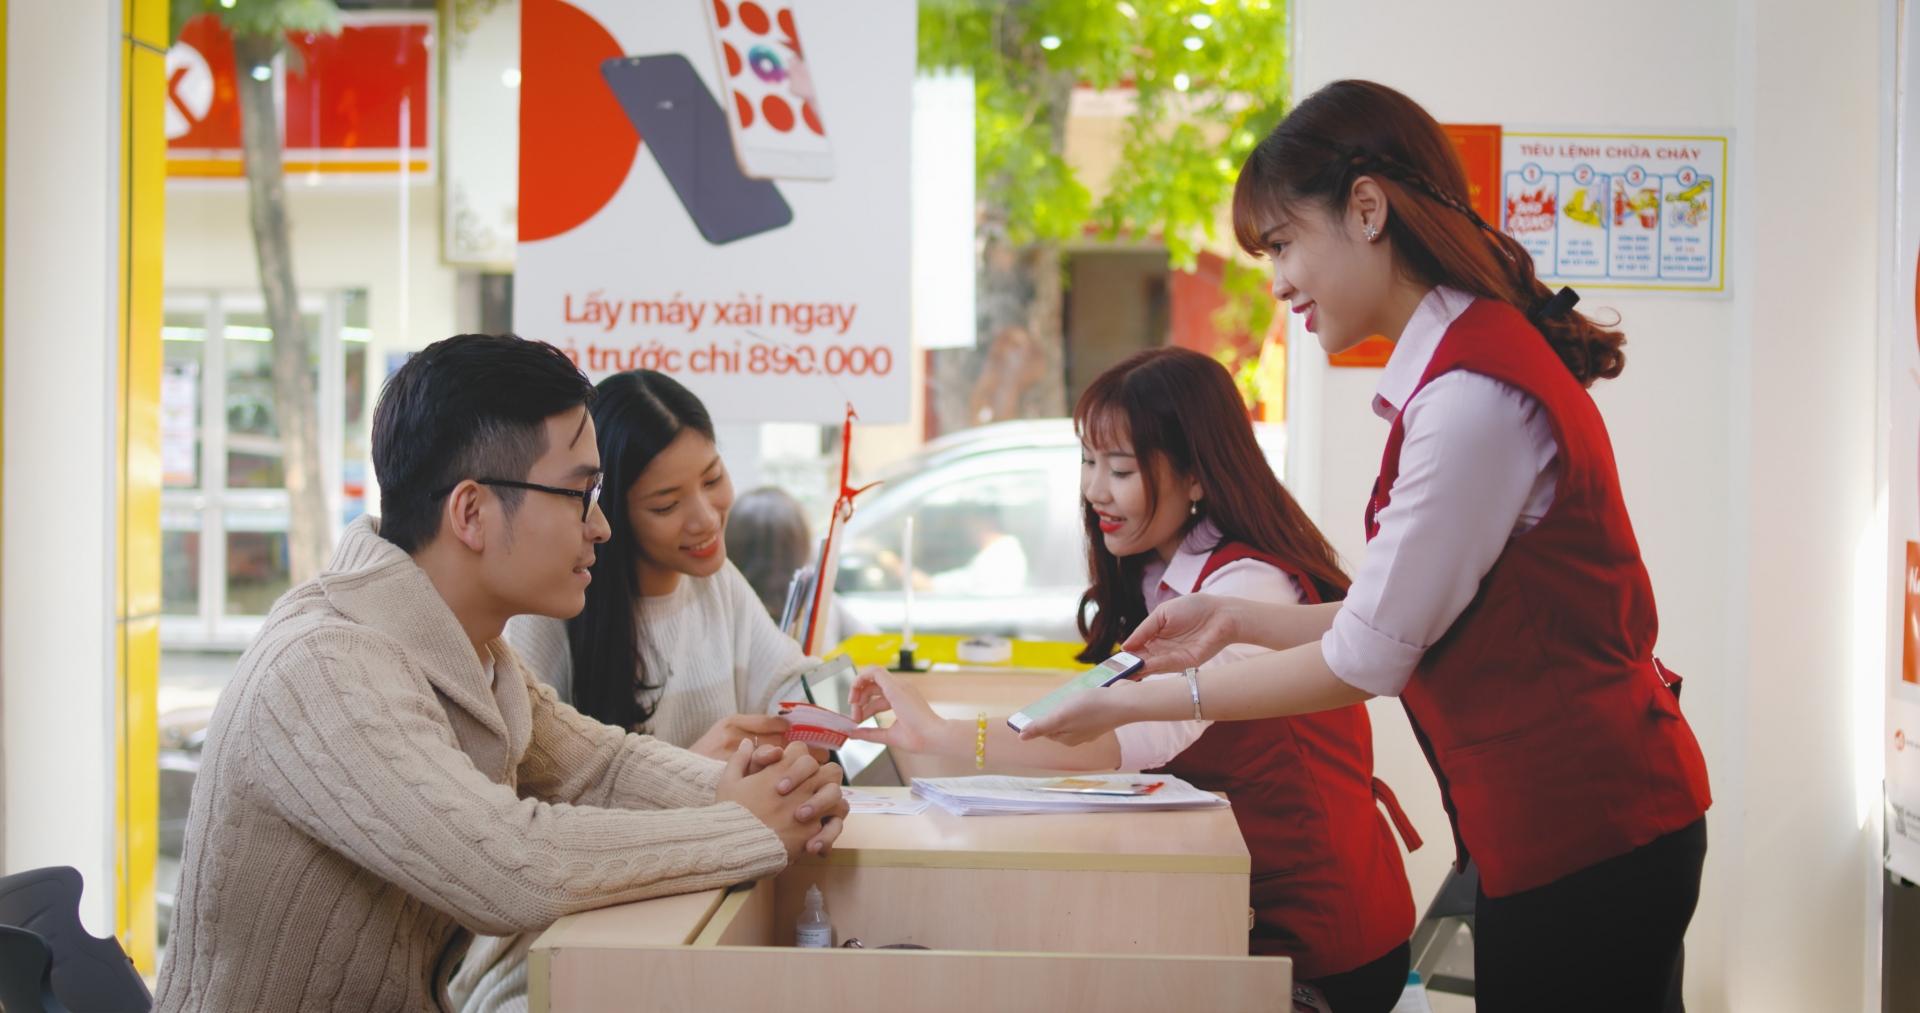 Safeguarding a hundred-billion-dollar consumer finance market